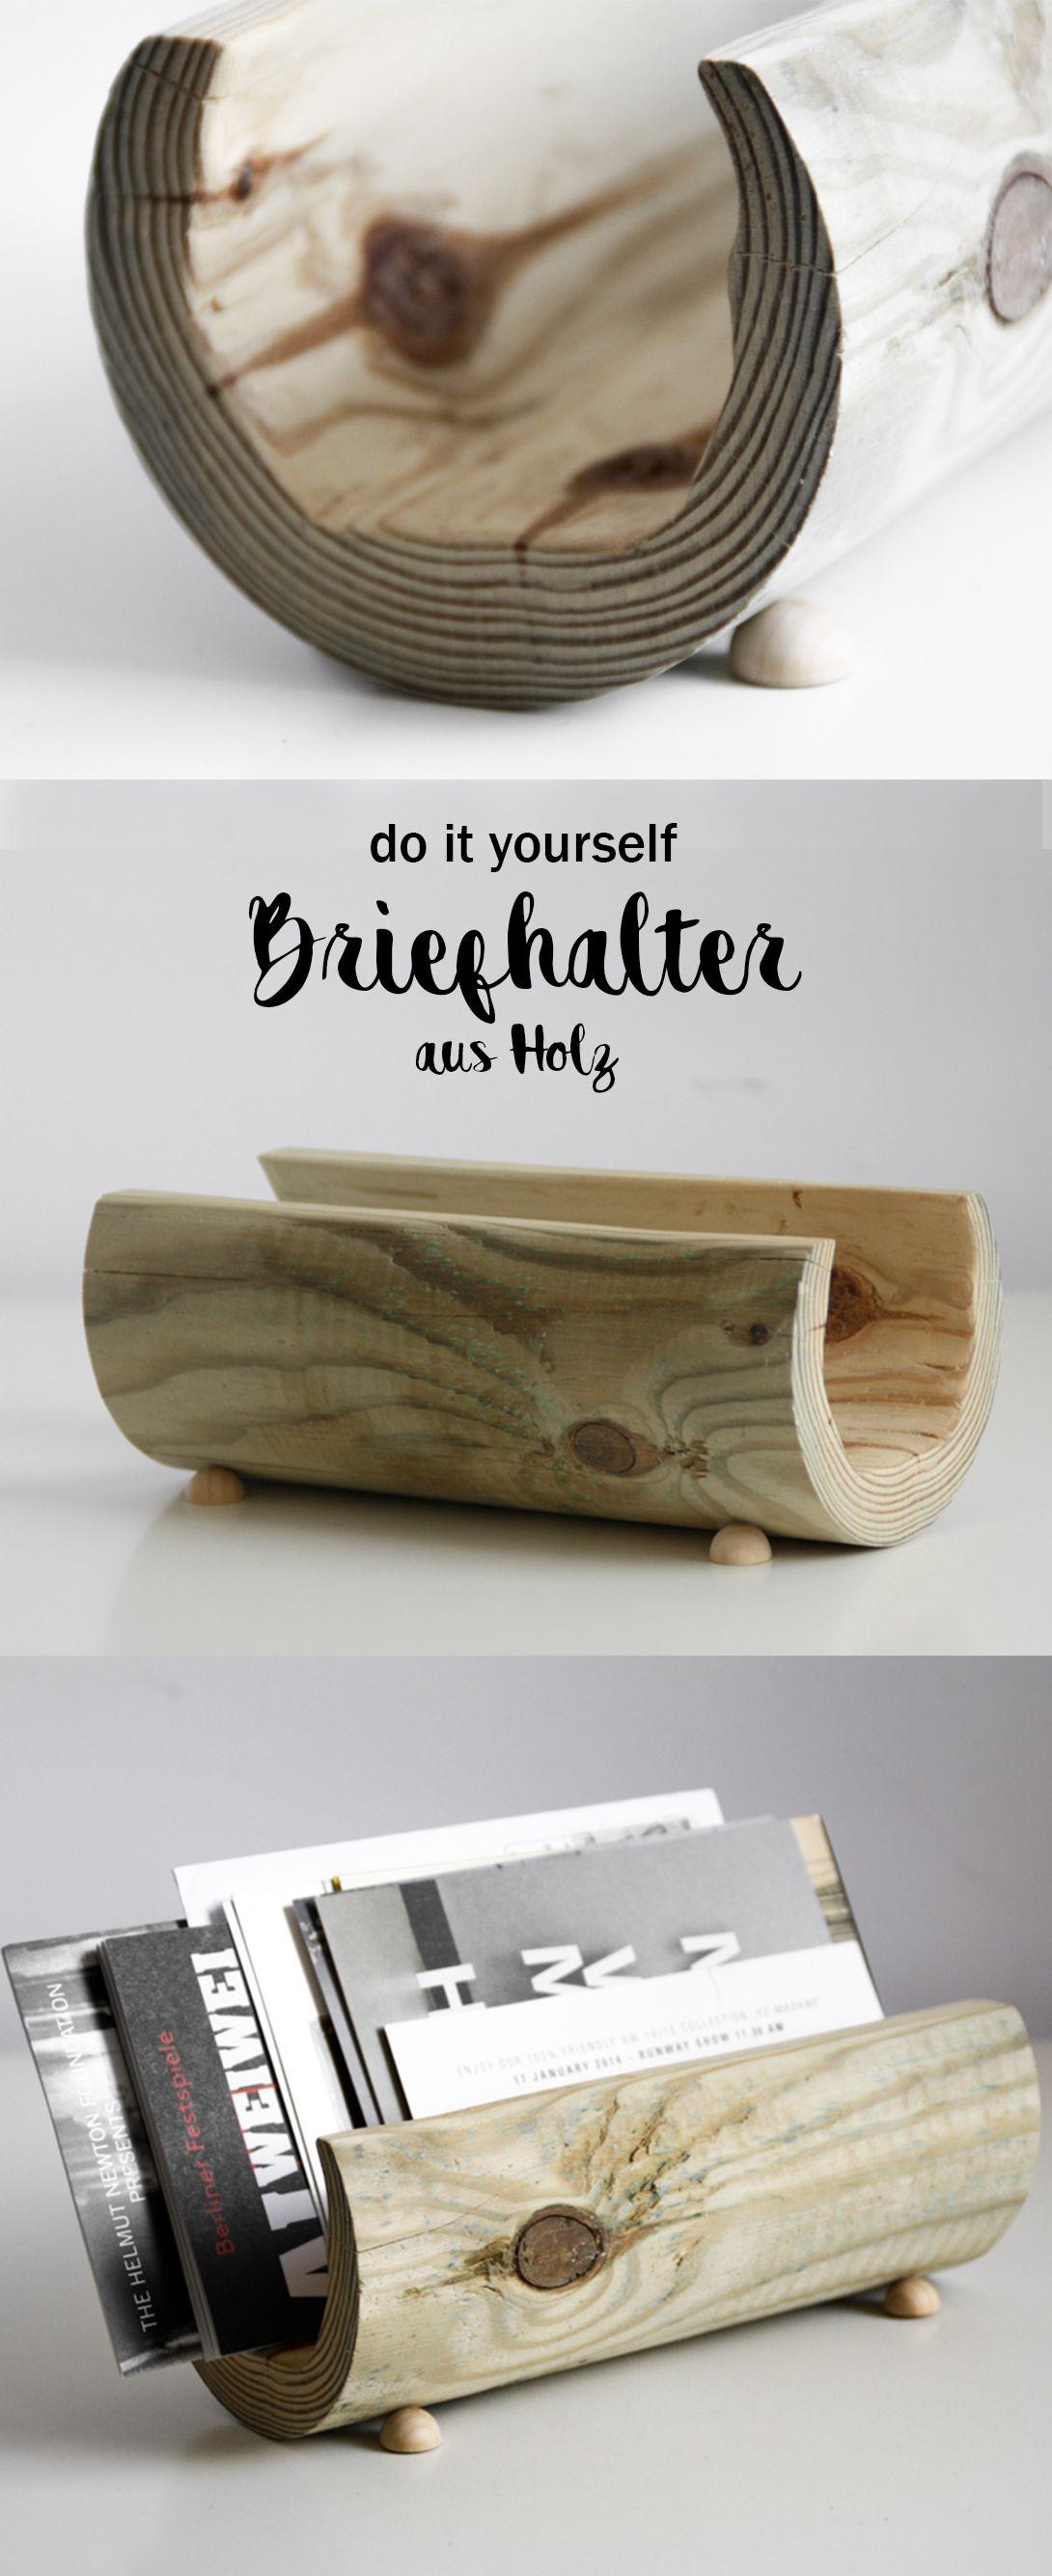 diy holz briefhalter basteln | bastelideen | pinterest | basteln